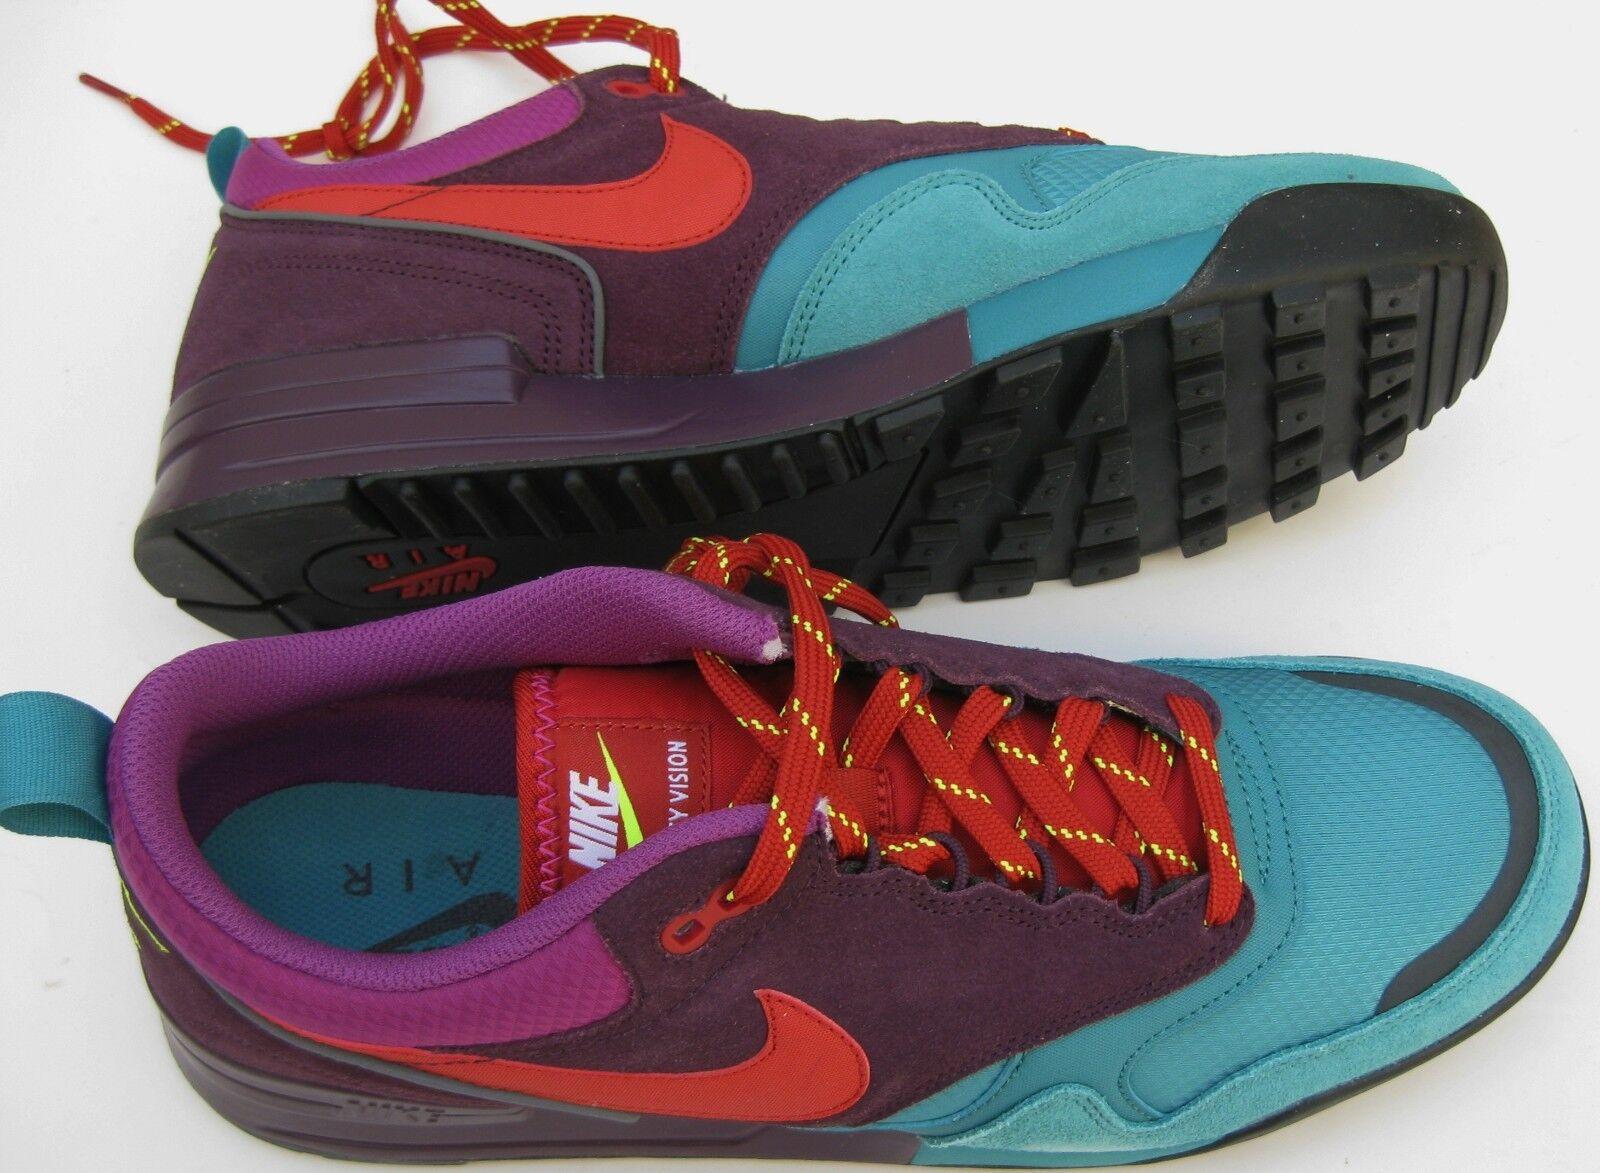 New Nike Odyssey Envision QS Uomo Shoe Size 9-11